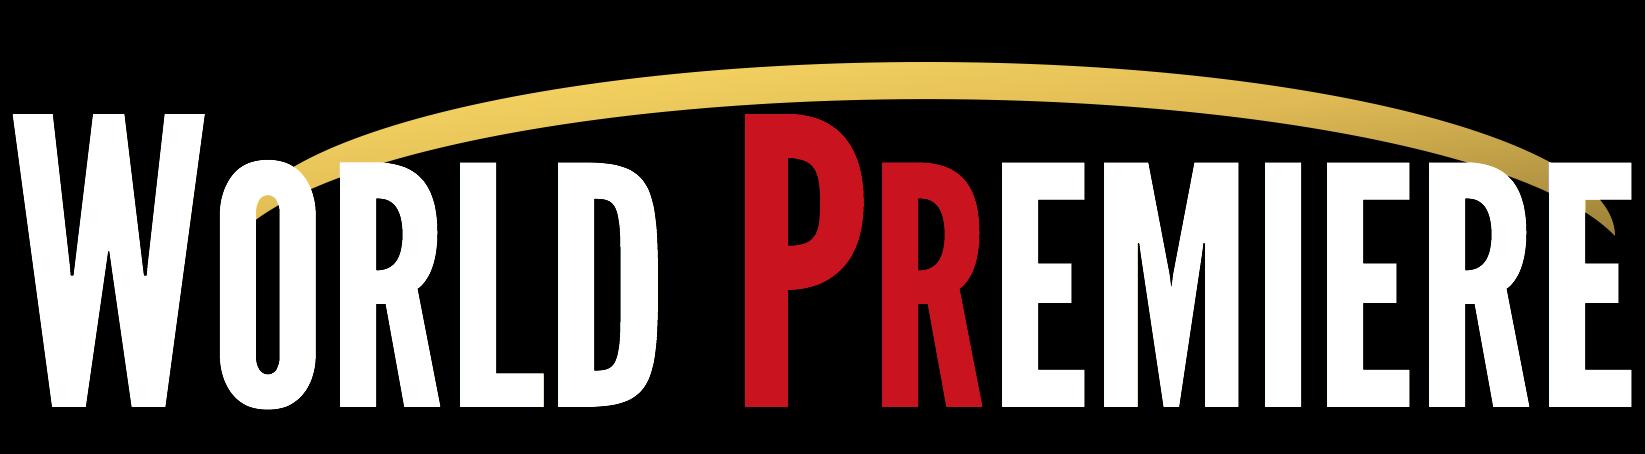 WORLD PREMIERE Co.,Ltd.